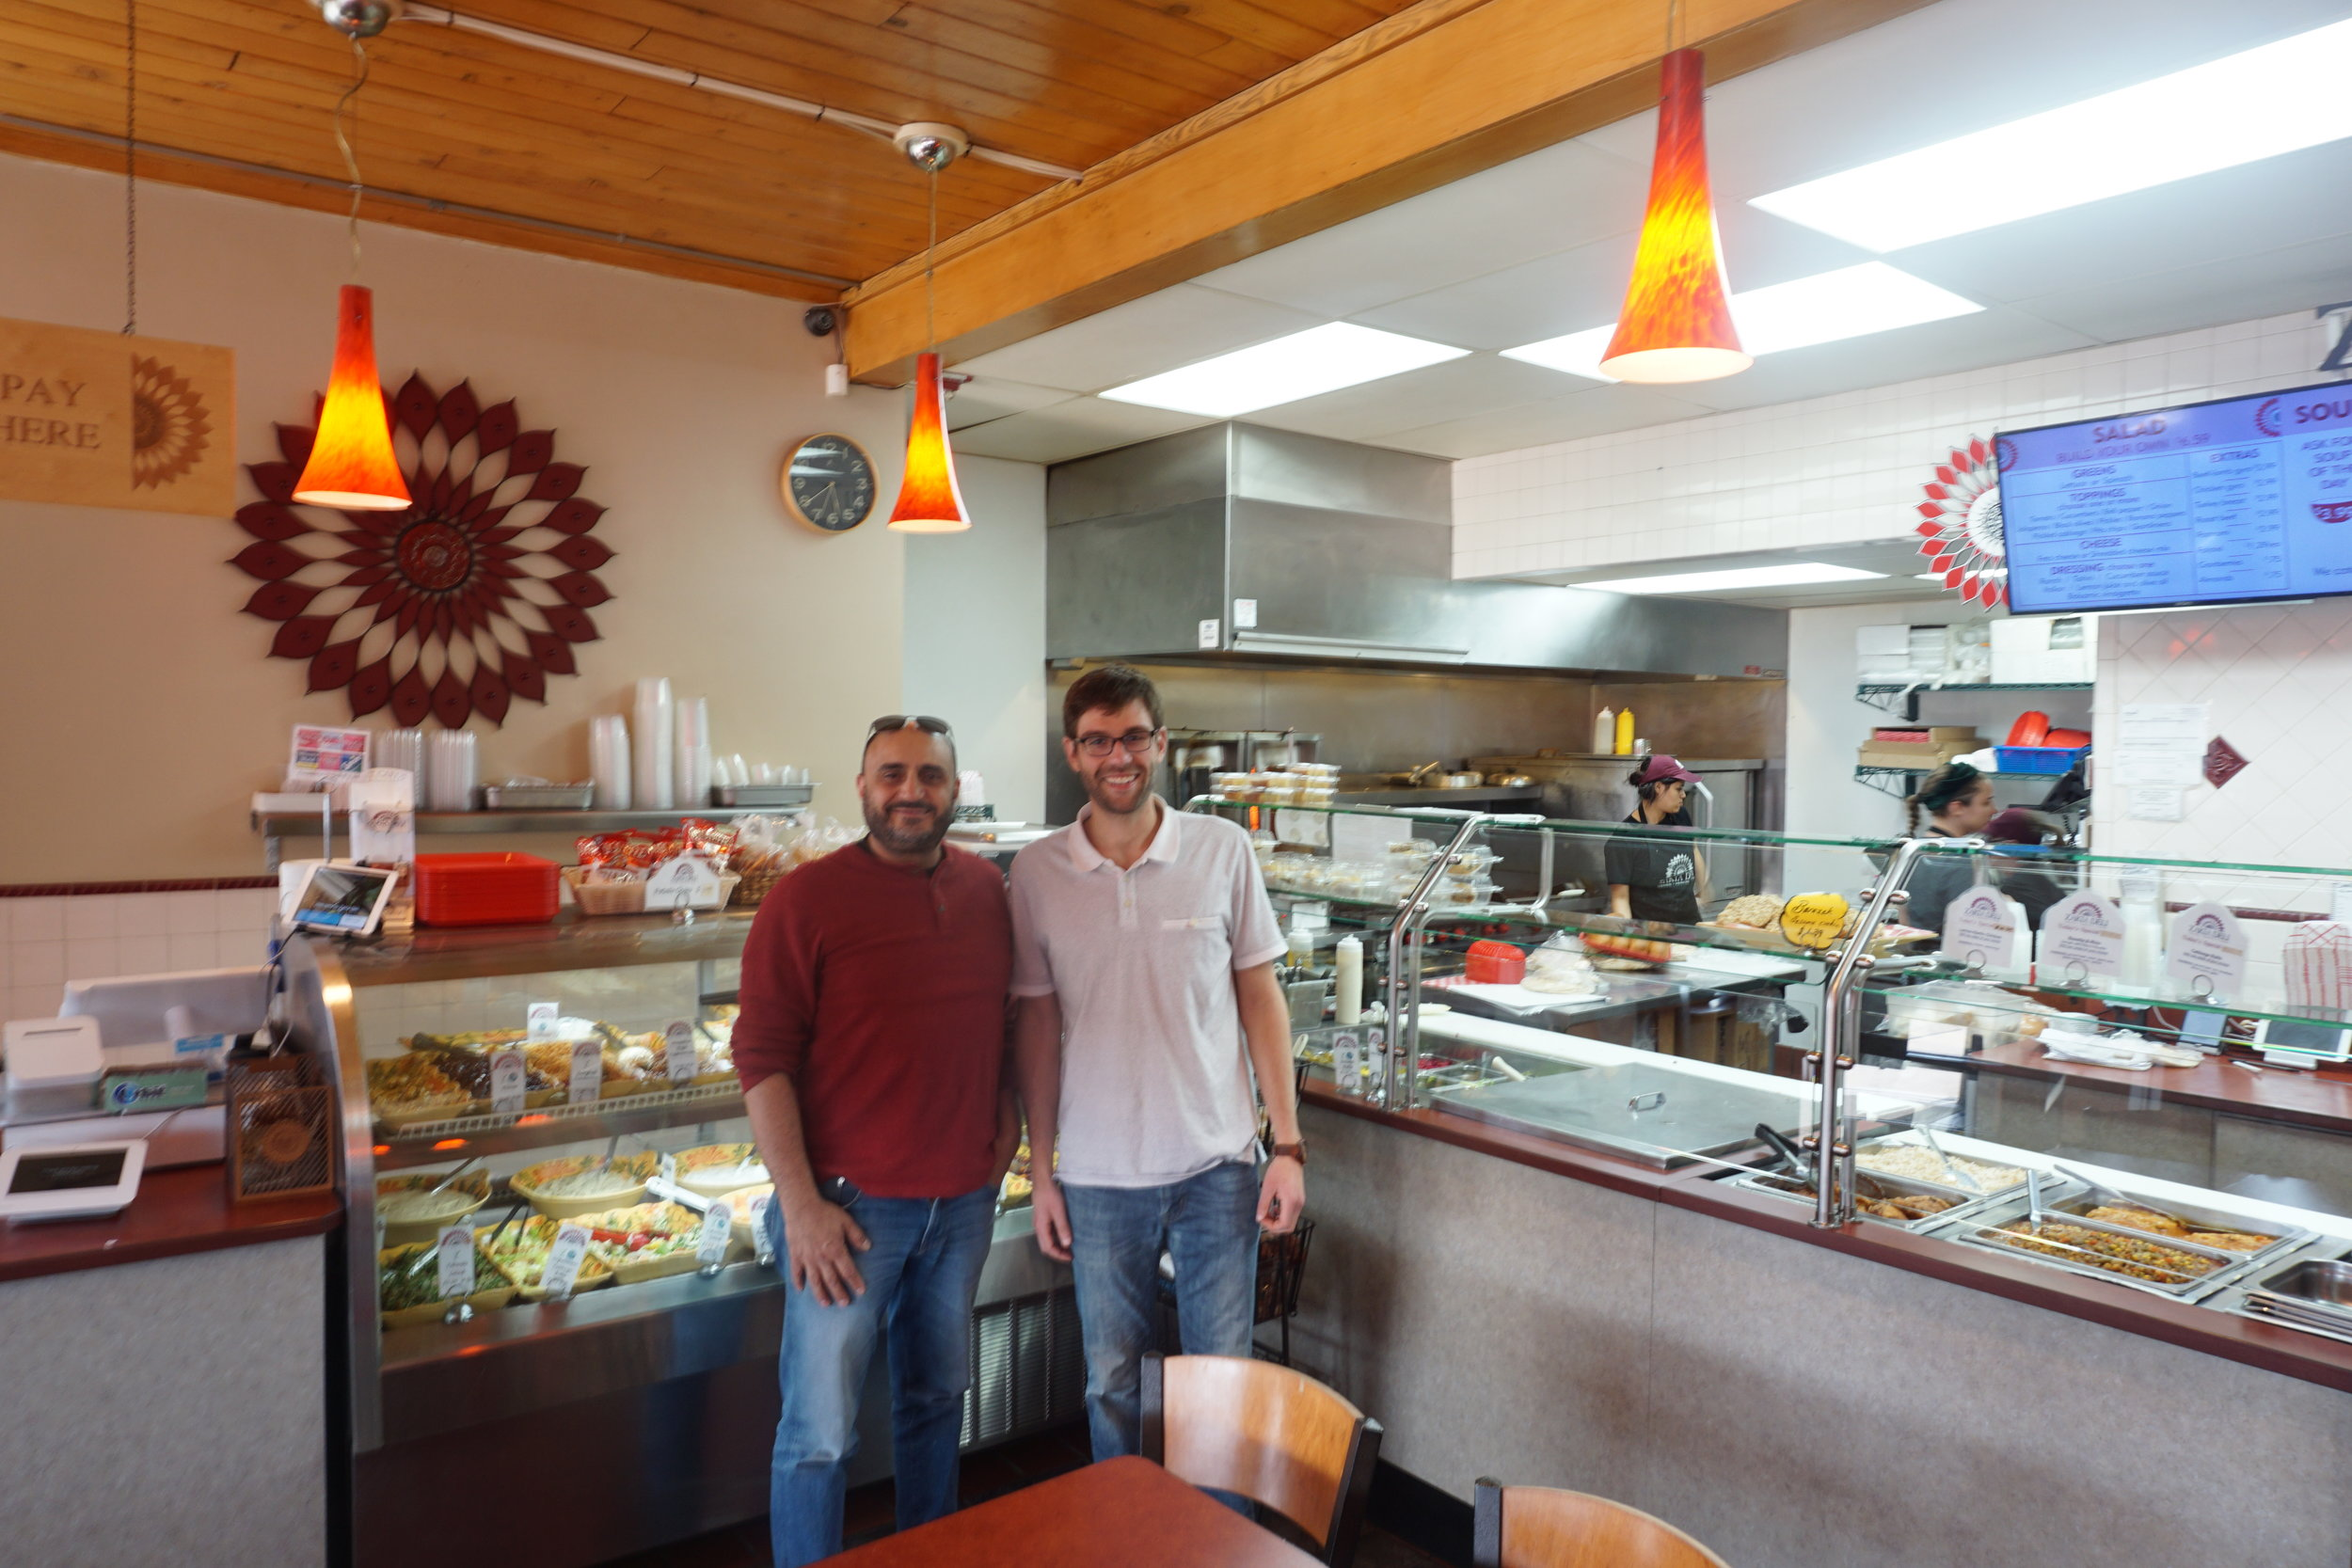 David and I with the Zaki Deli Kitchen in the background